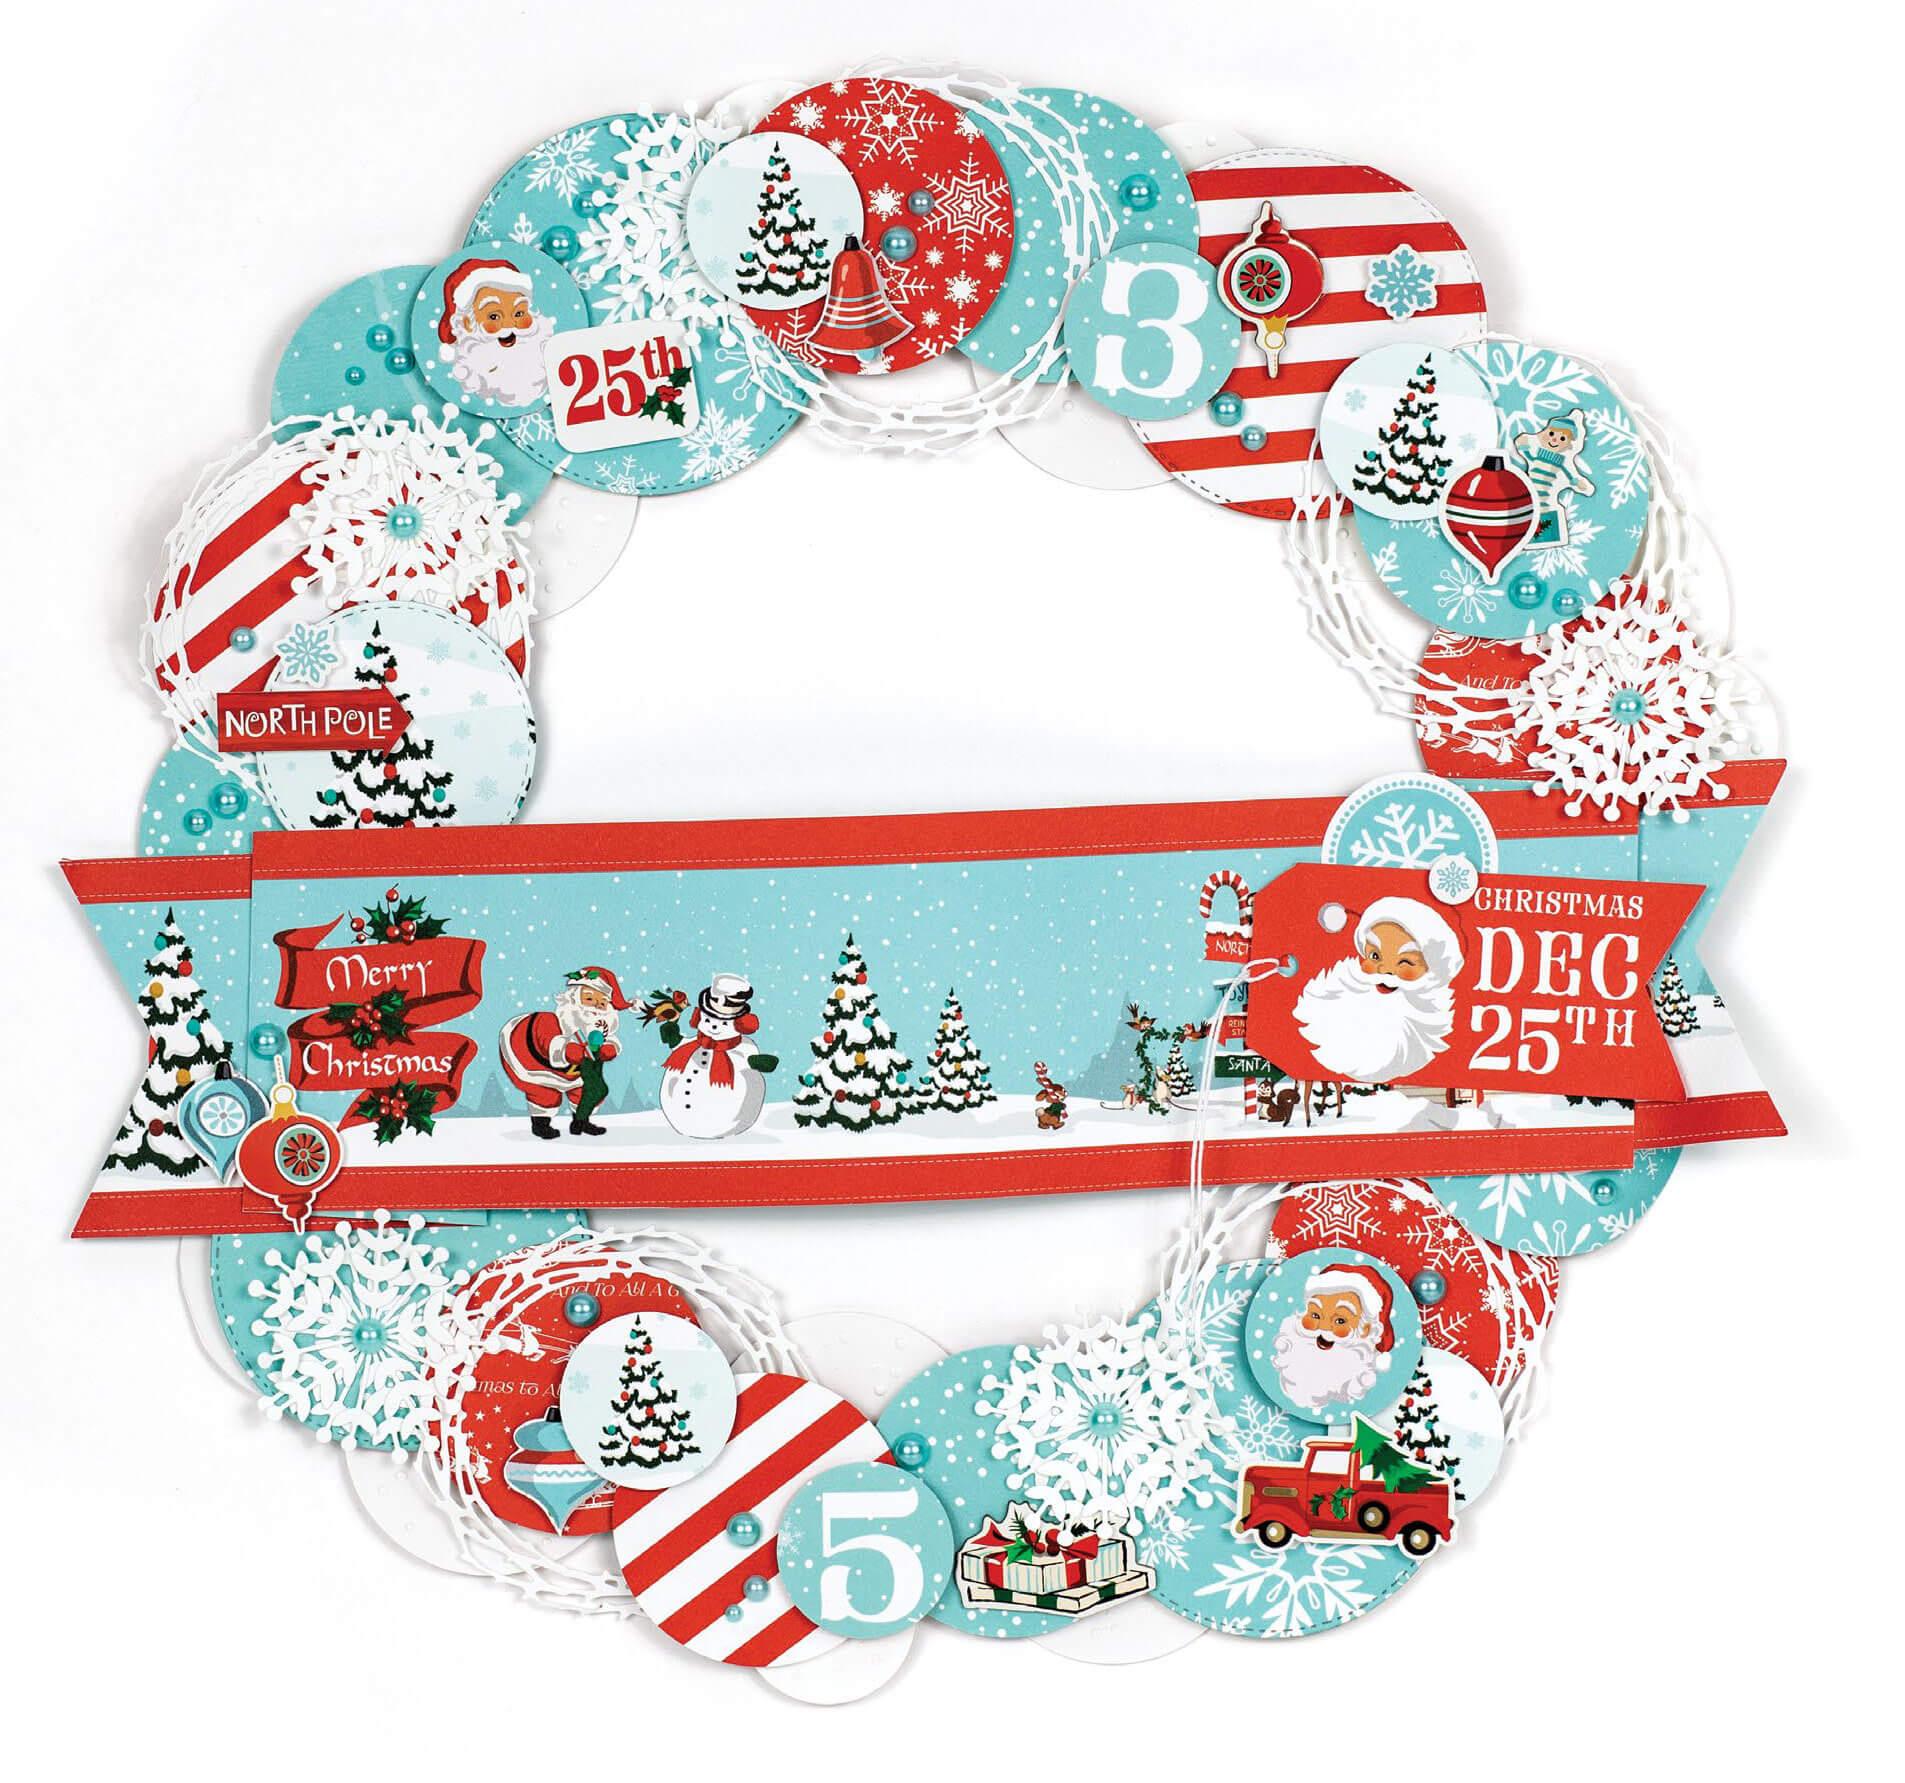 SCT Winter 2018 - Dec 25th Wreath by Anya Lunchenko